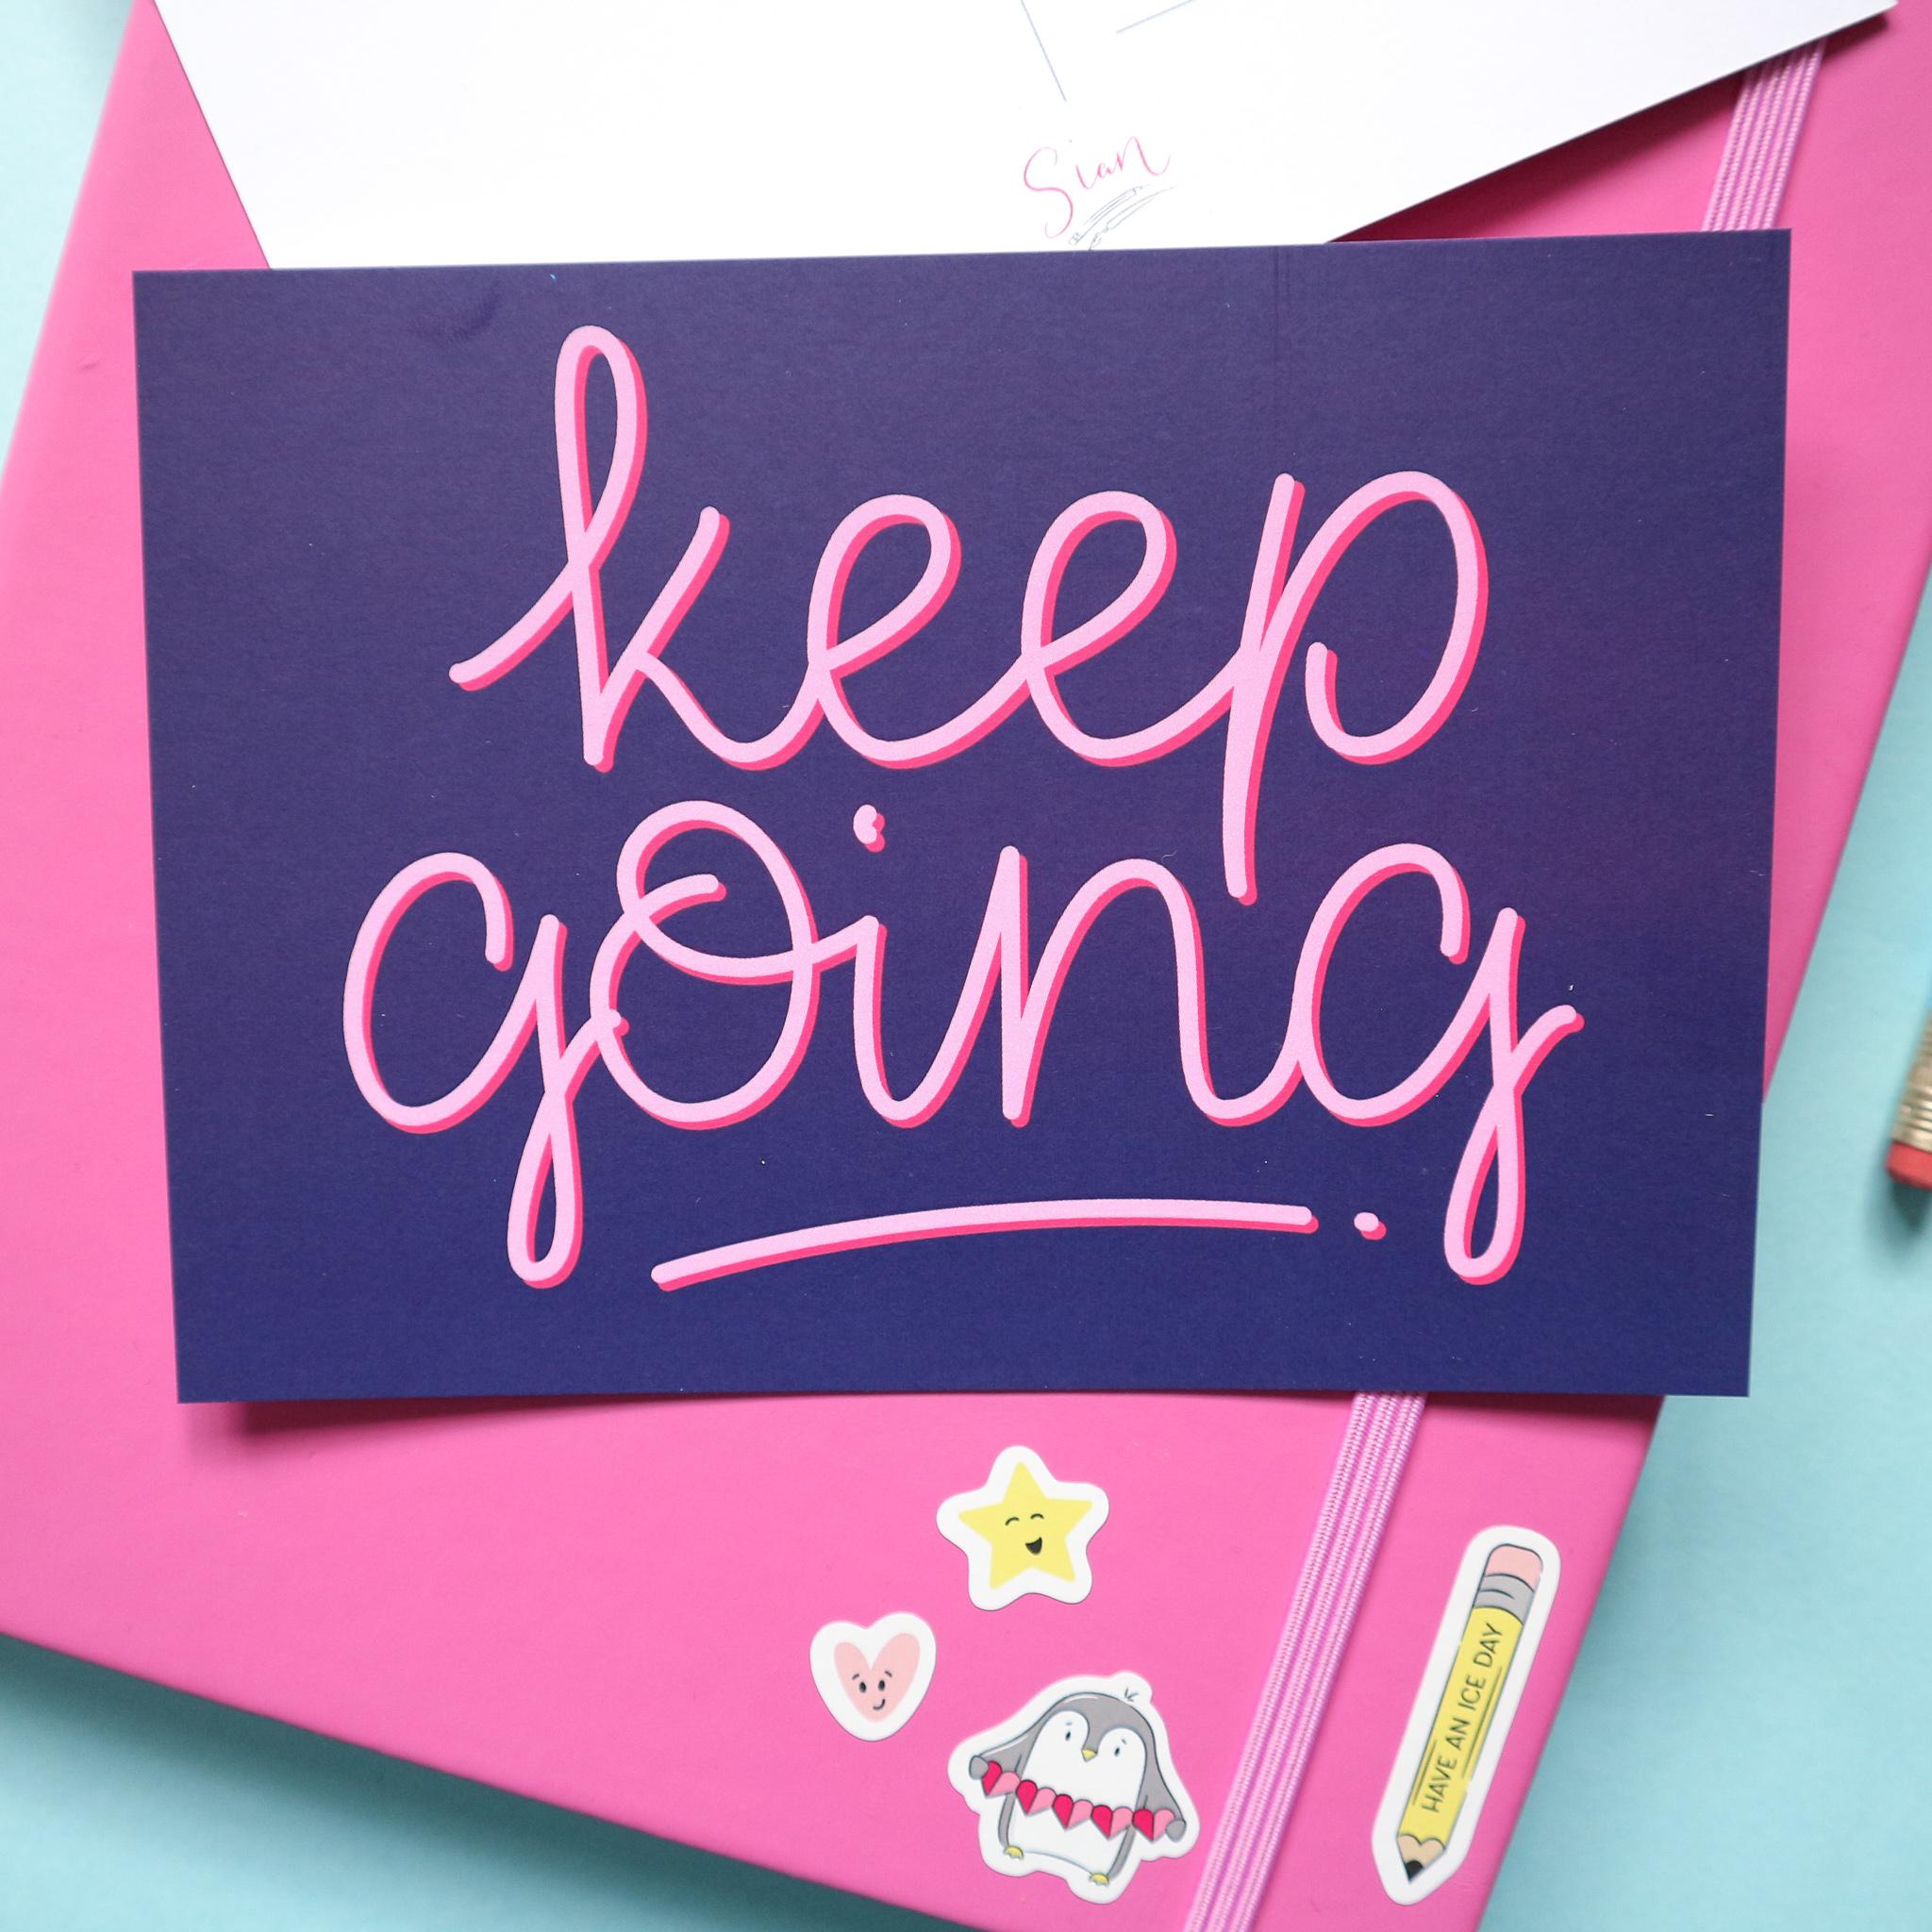 Keep Going Postcard Design by Sian Shrimpton